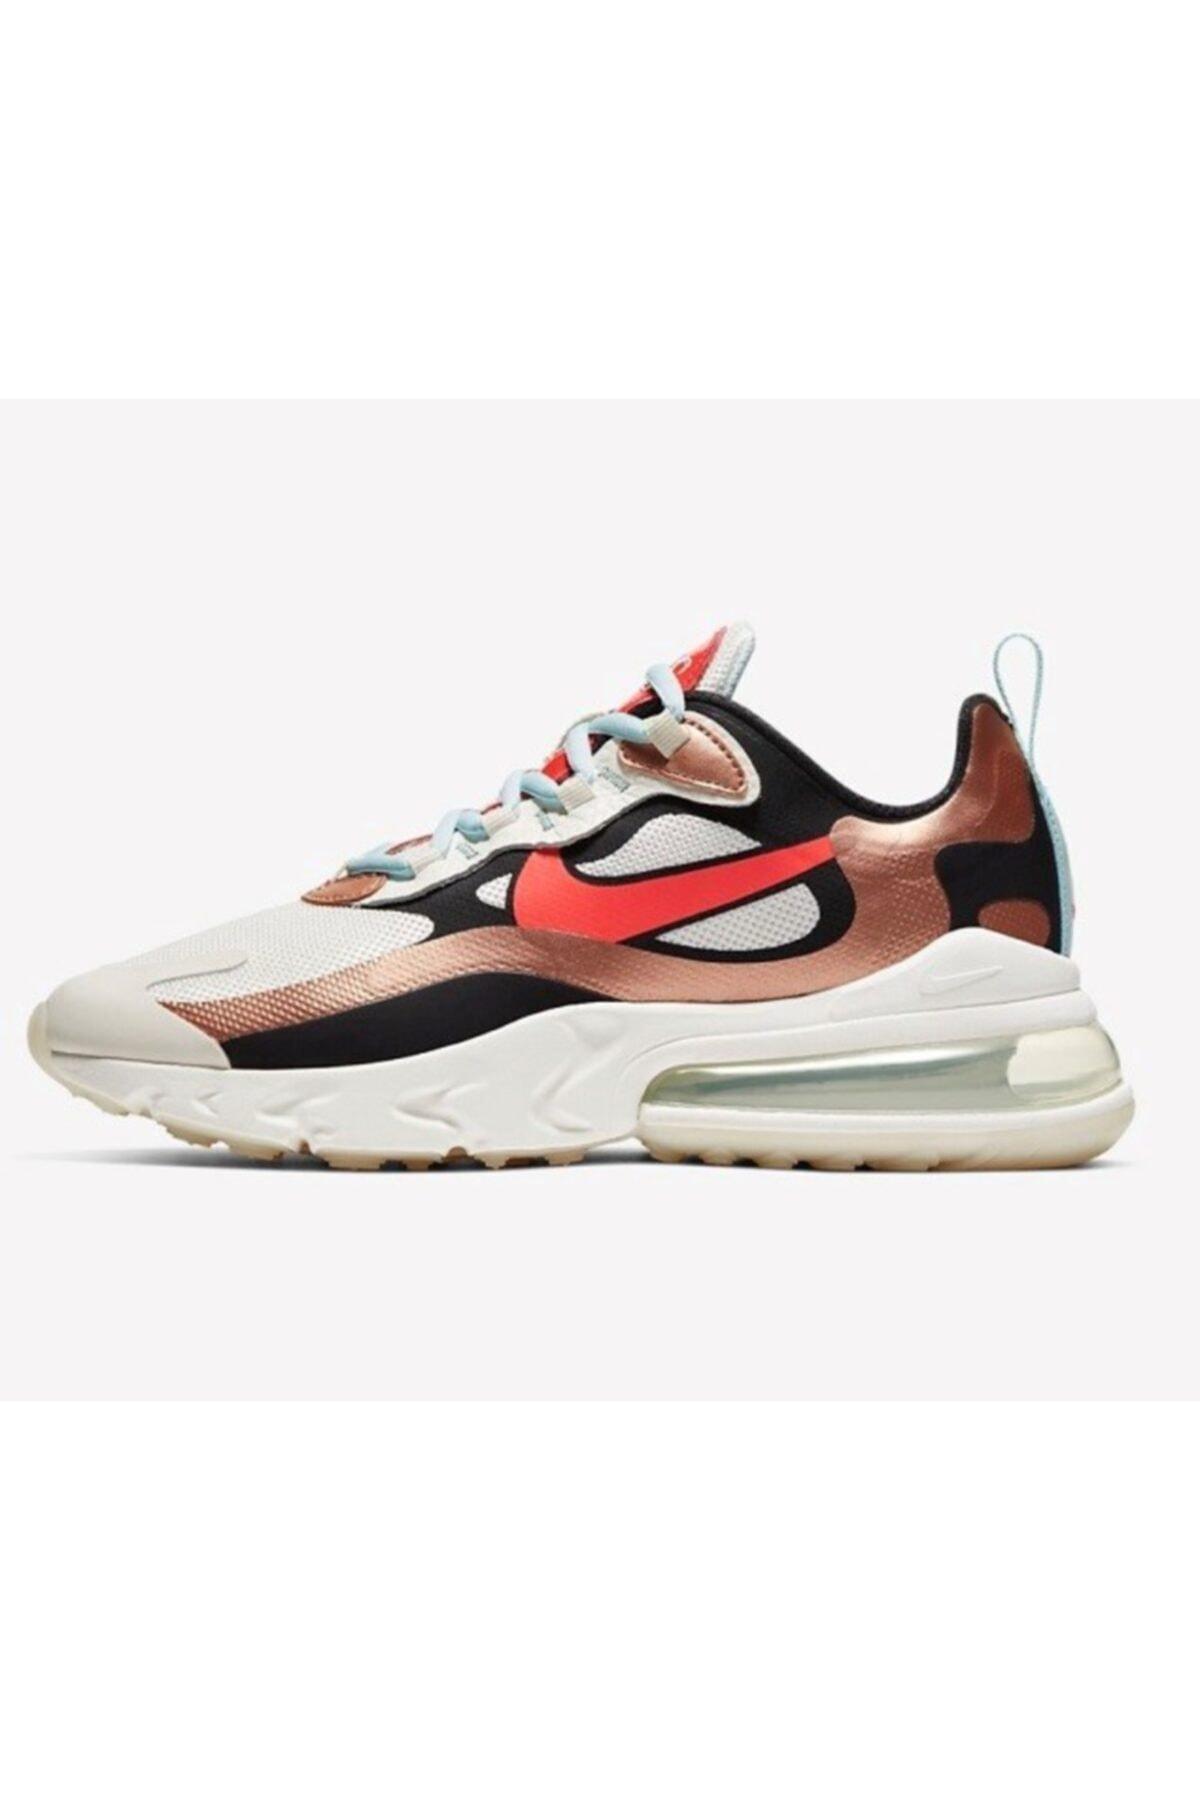 Nike Air Max 270 React Kadın Spor Ayakkabı Ct3428-100 1